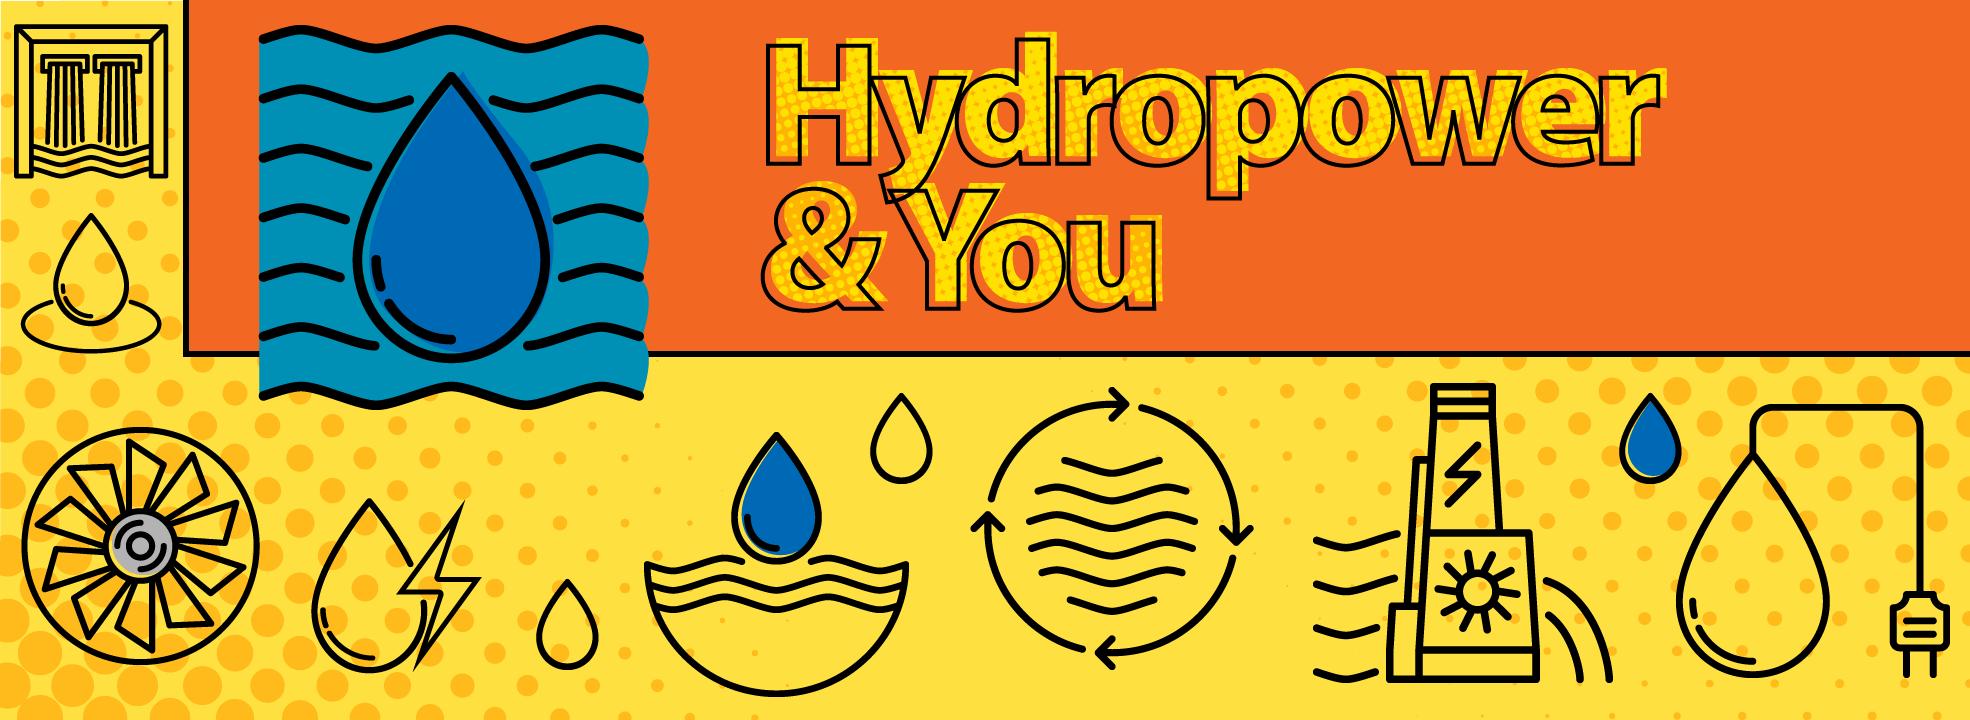 XXXXX Hydropower and You landing bnr 1970x720